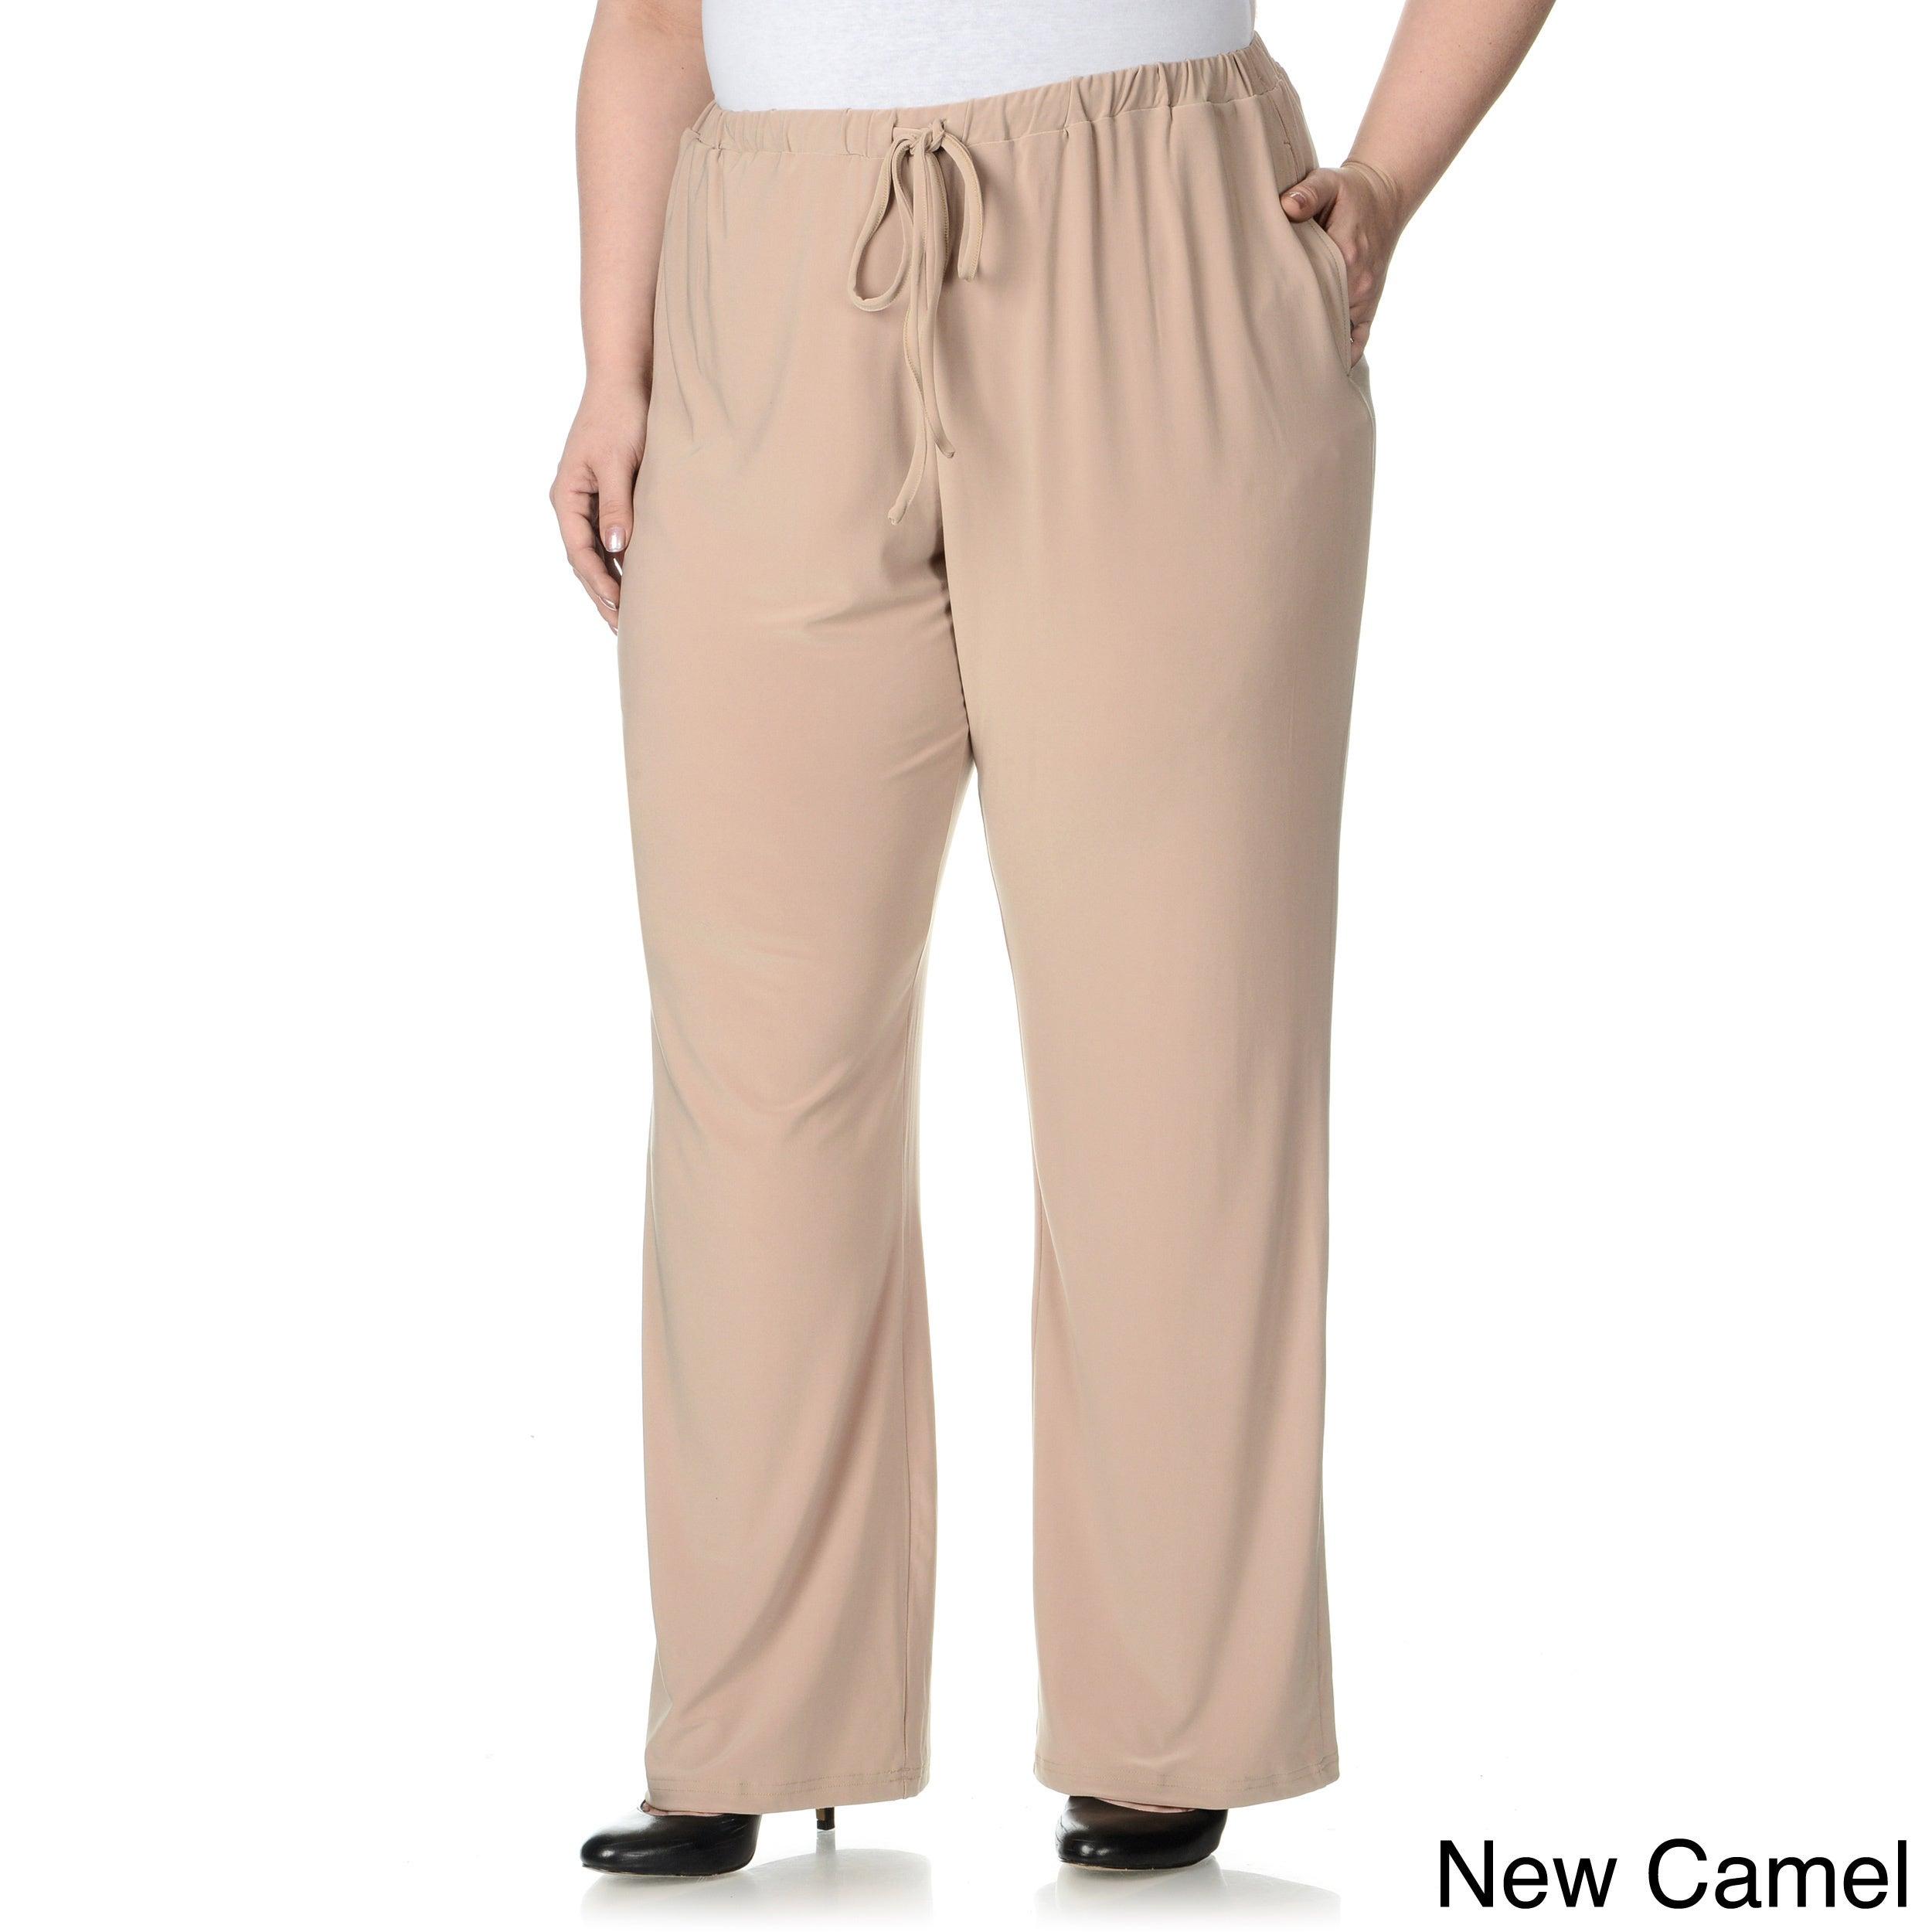 Lennie For Nina Leonard Womens Plus Size Drawstring Pull on Pants